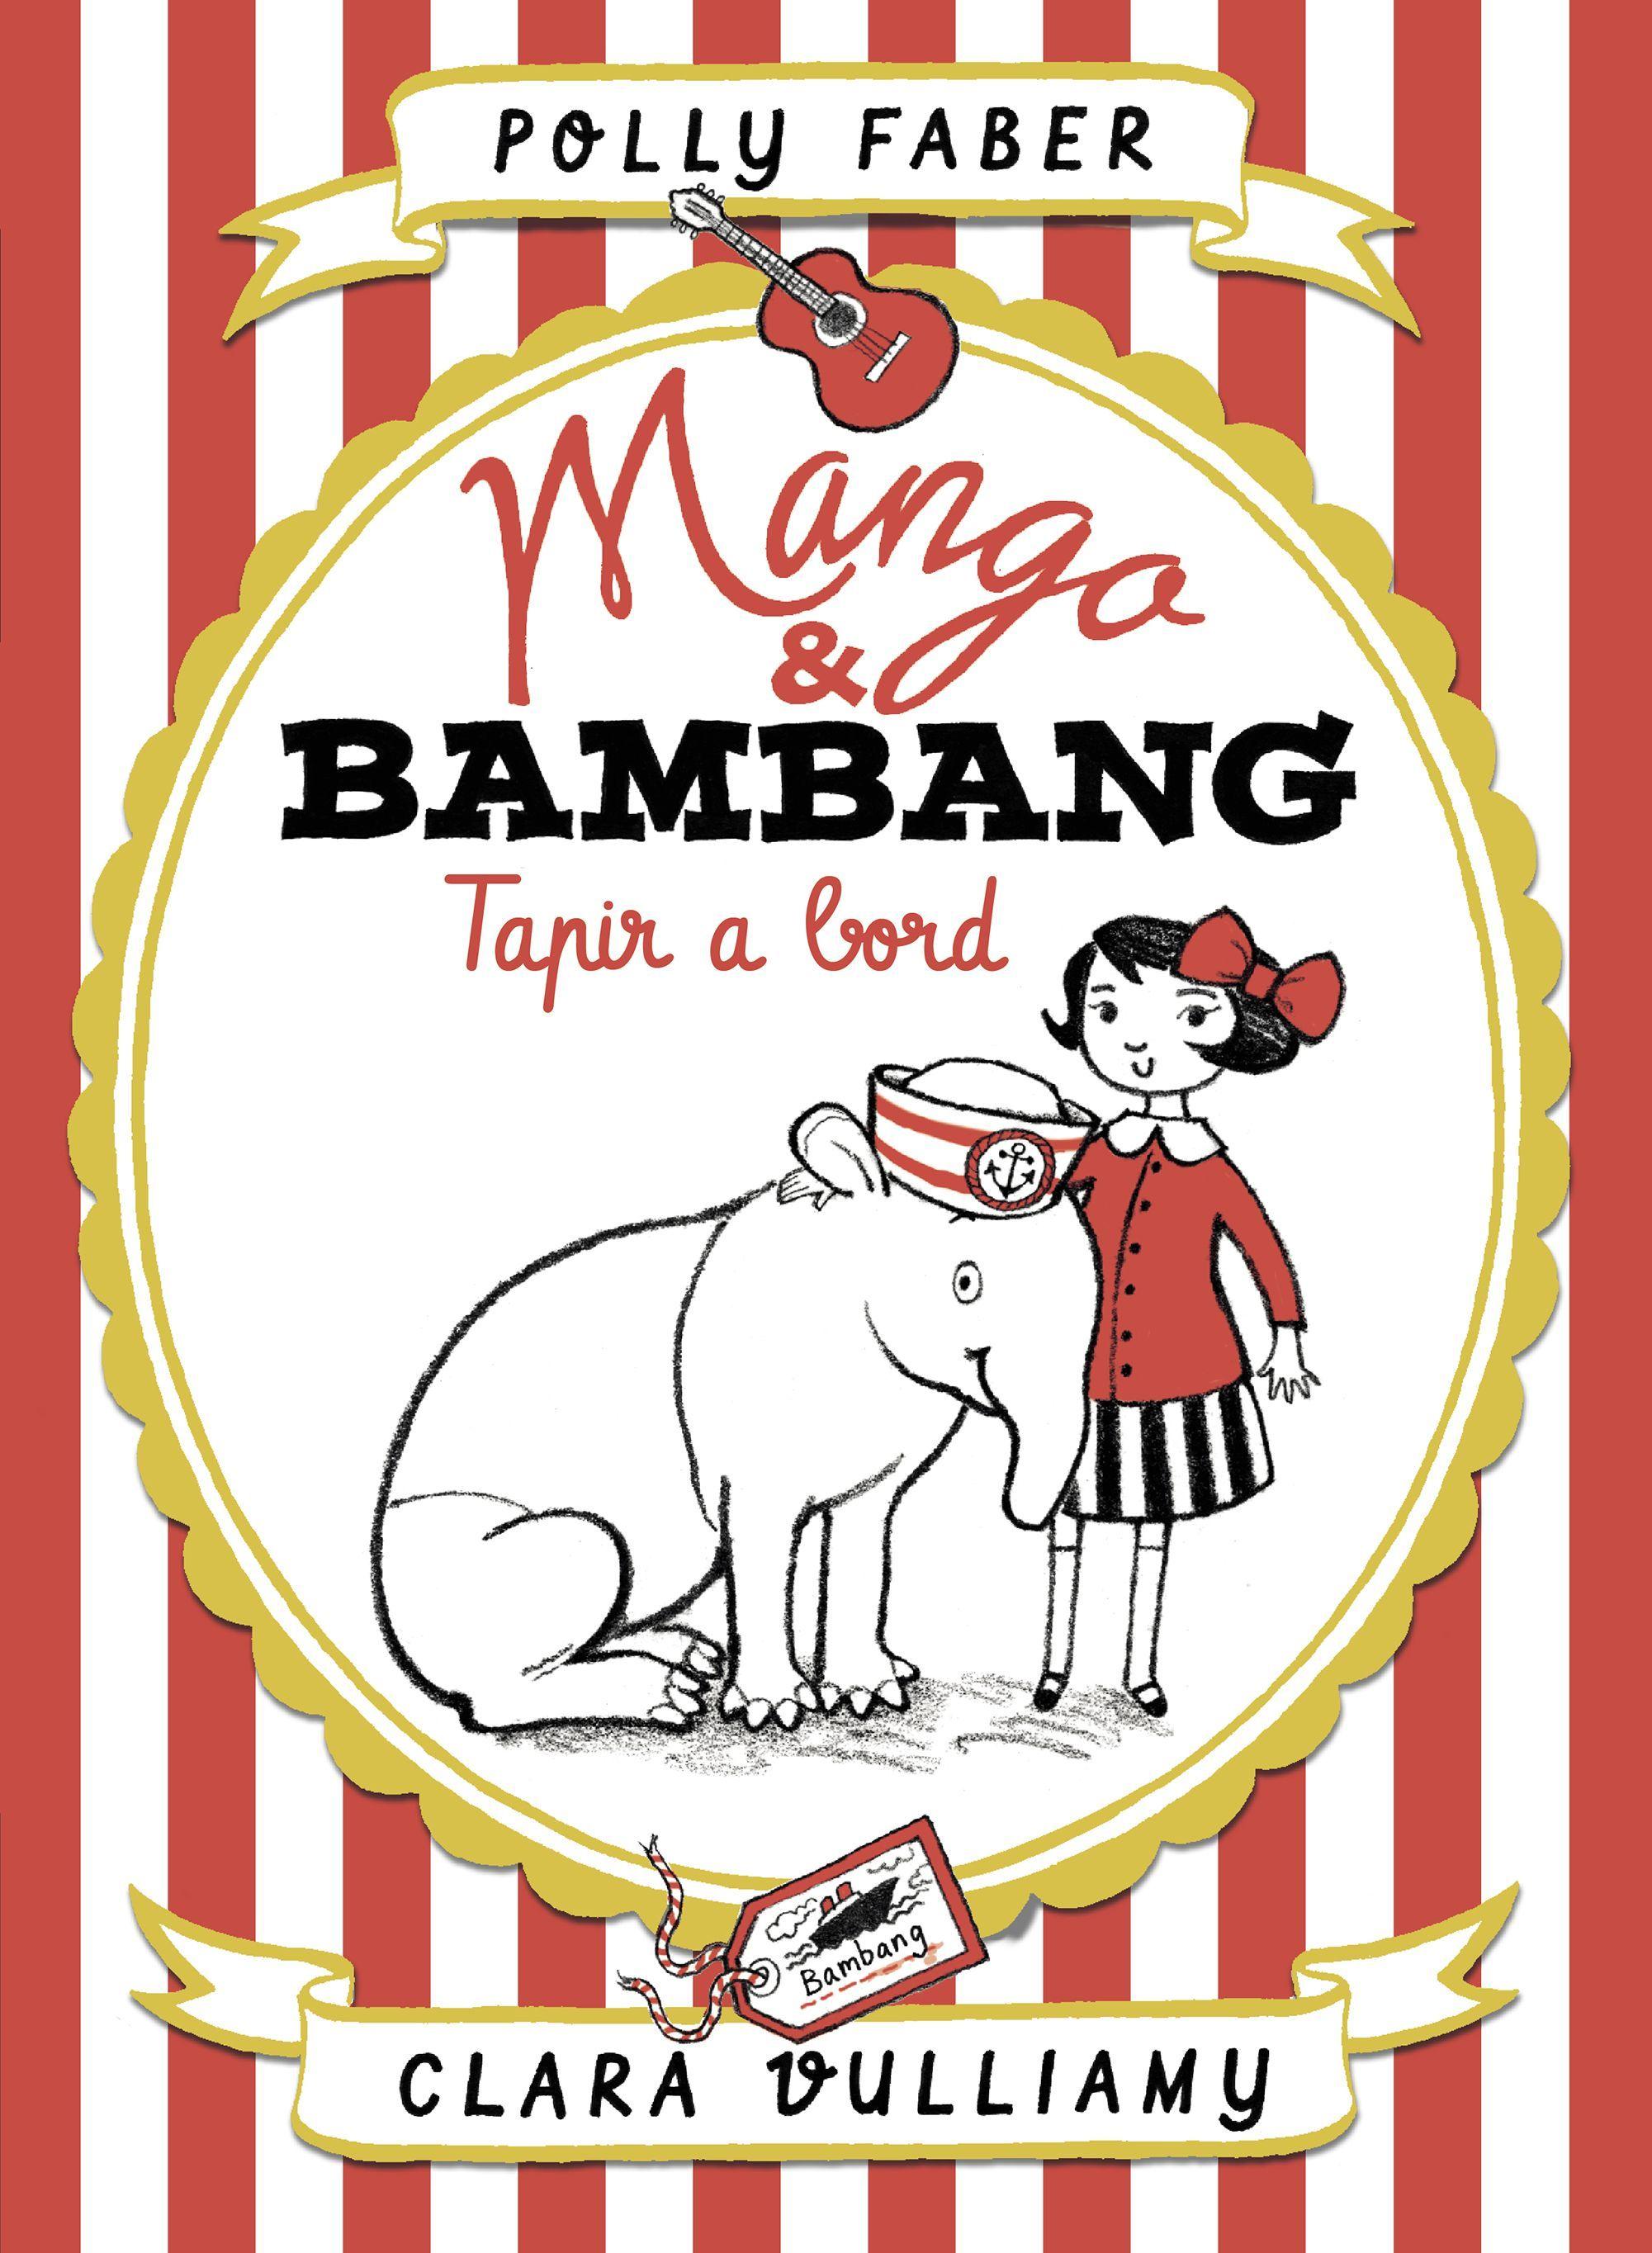 MANGO BAMBANG 2 TAPIR A BORD